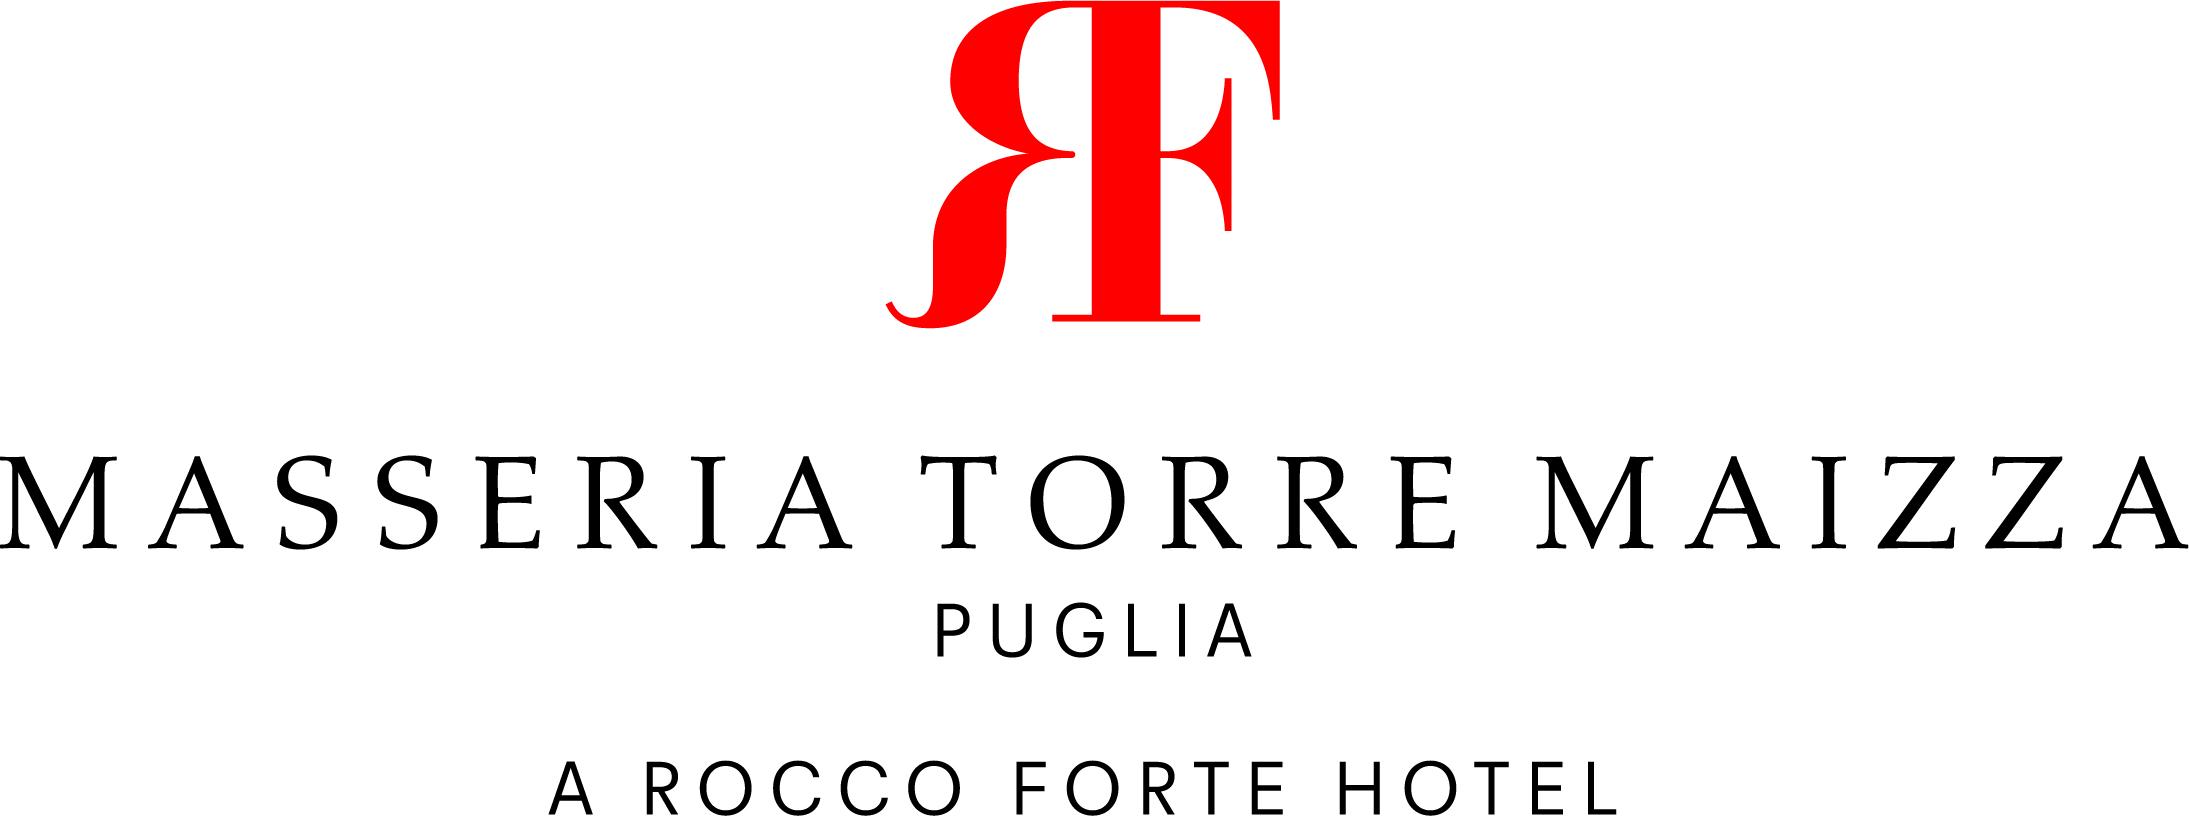 Masseria Torre Maizza - logo.jpg